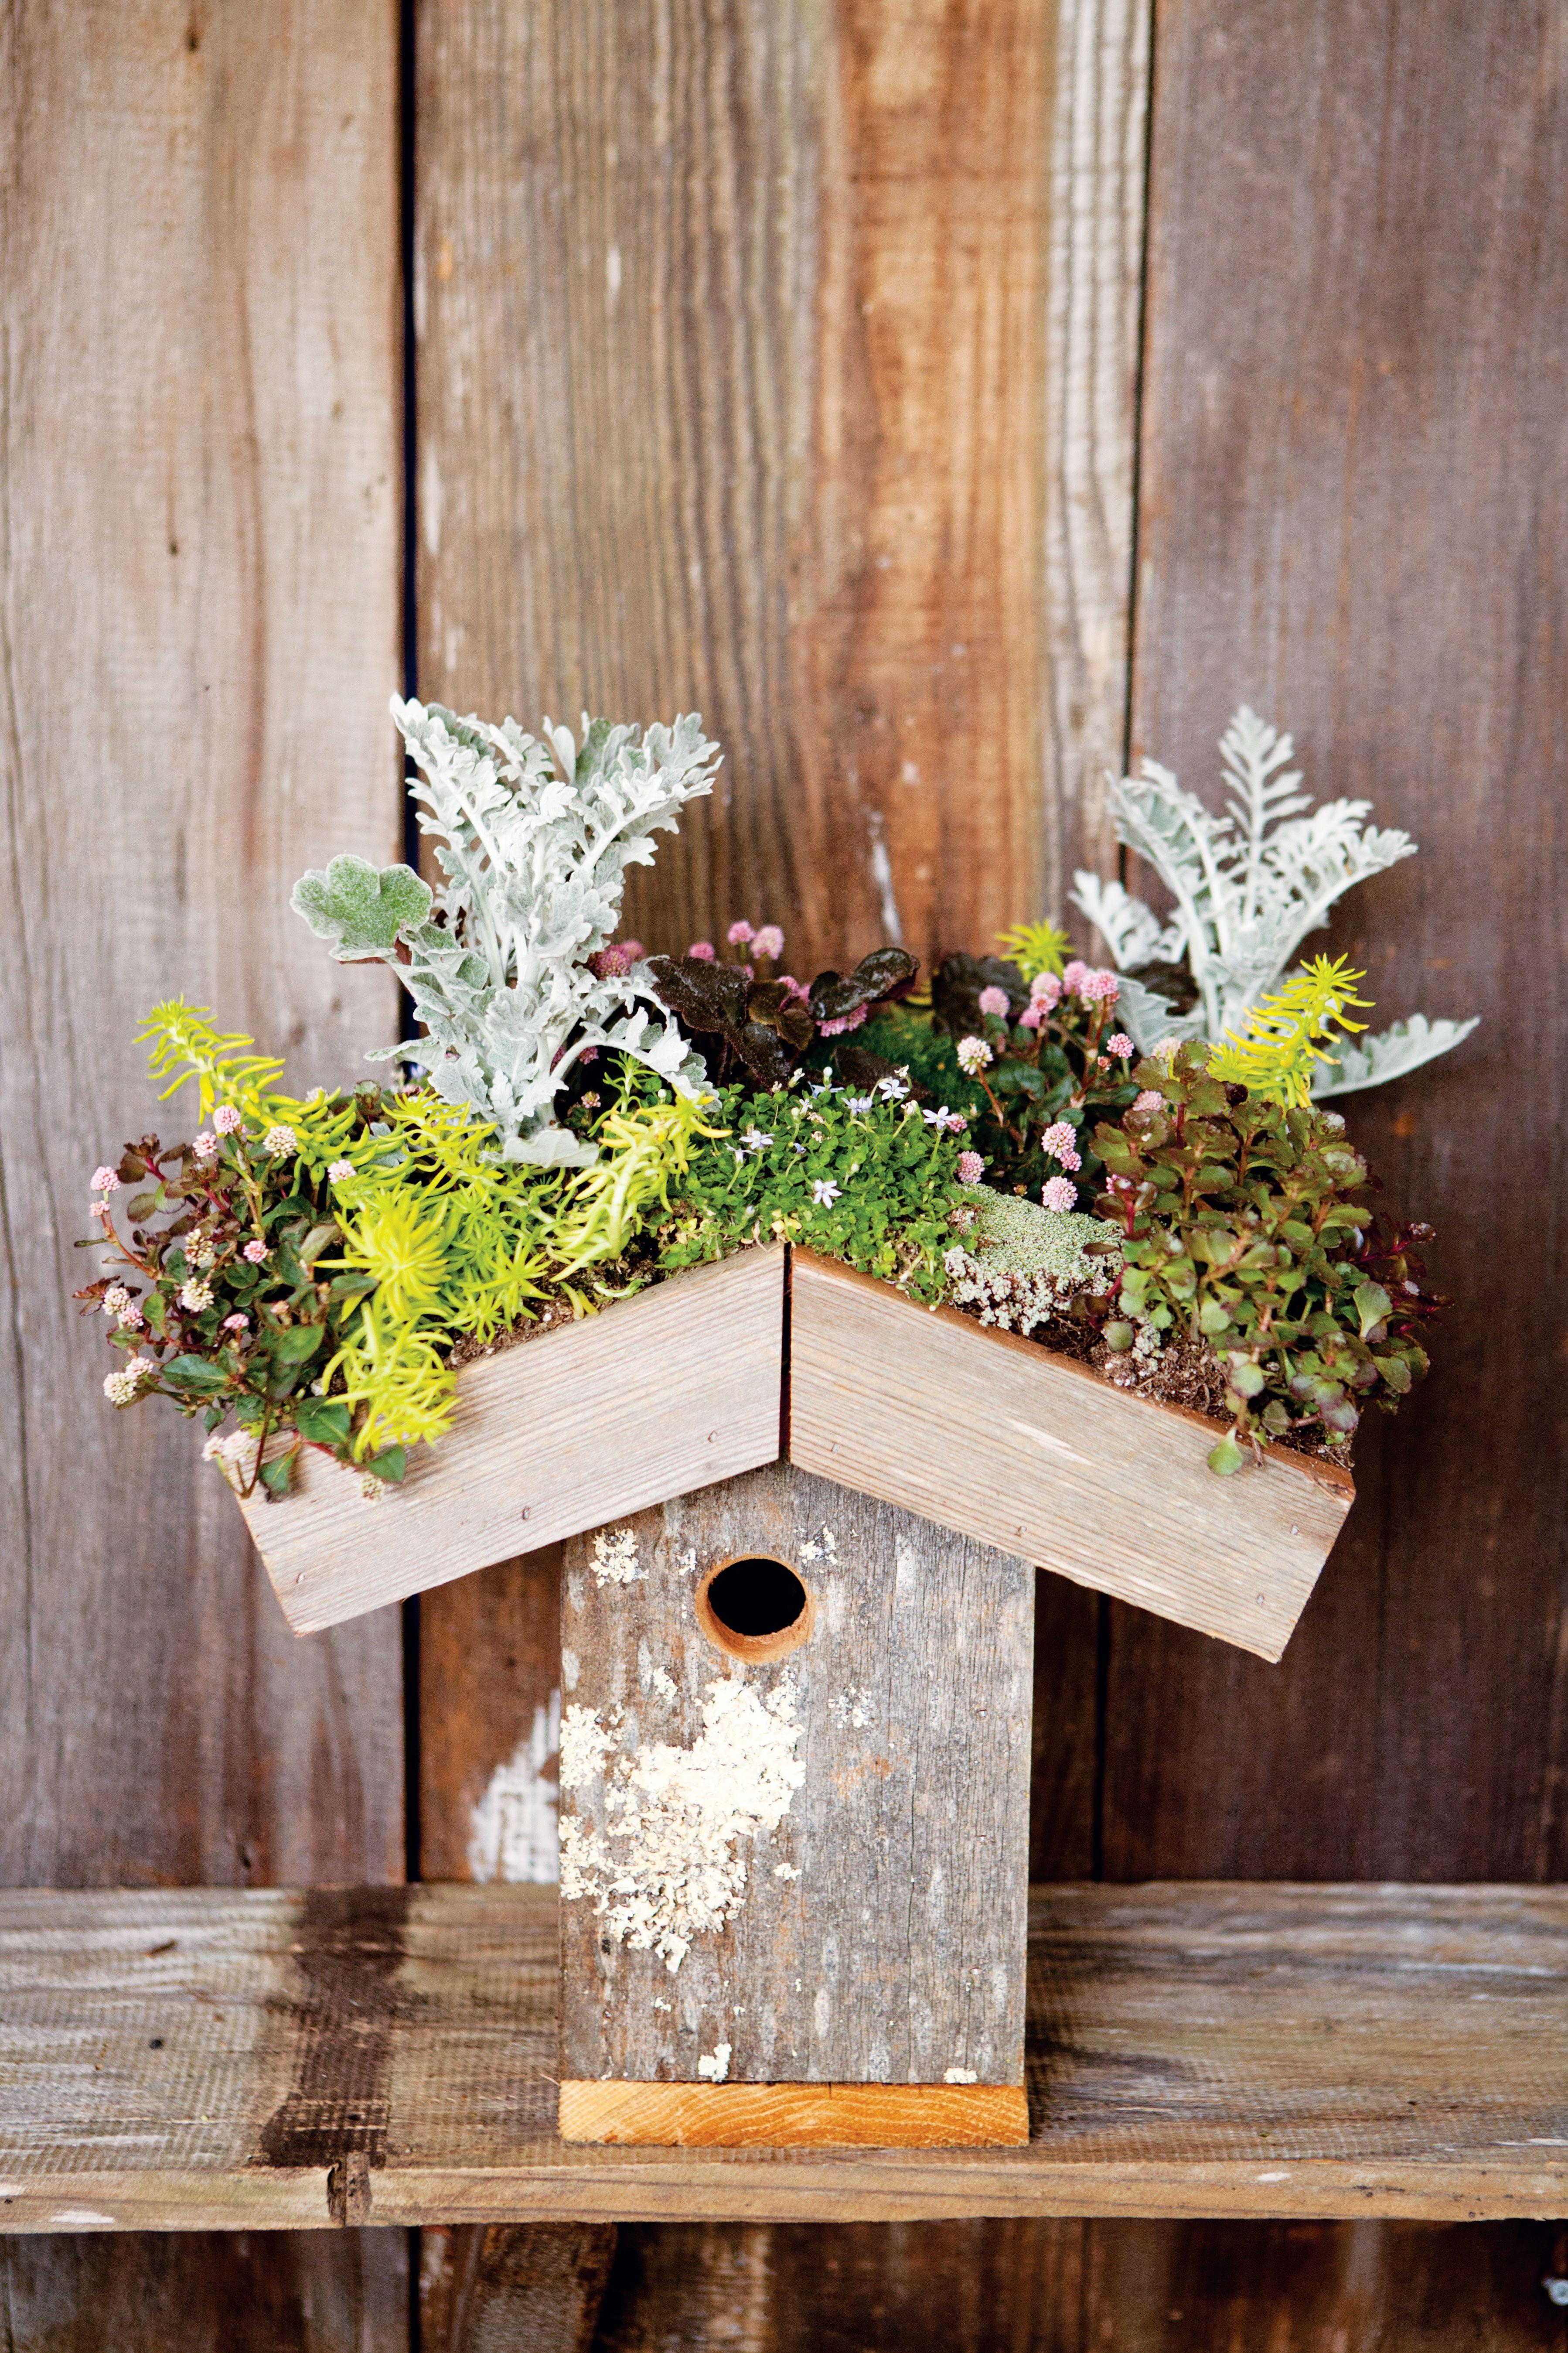 Favorite DIY Garden Projects Sunset Winter plants